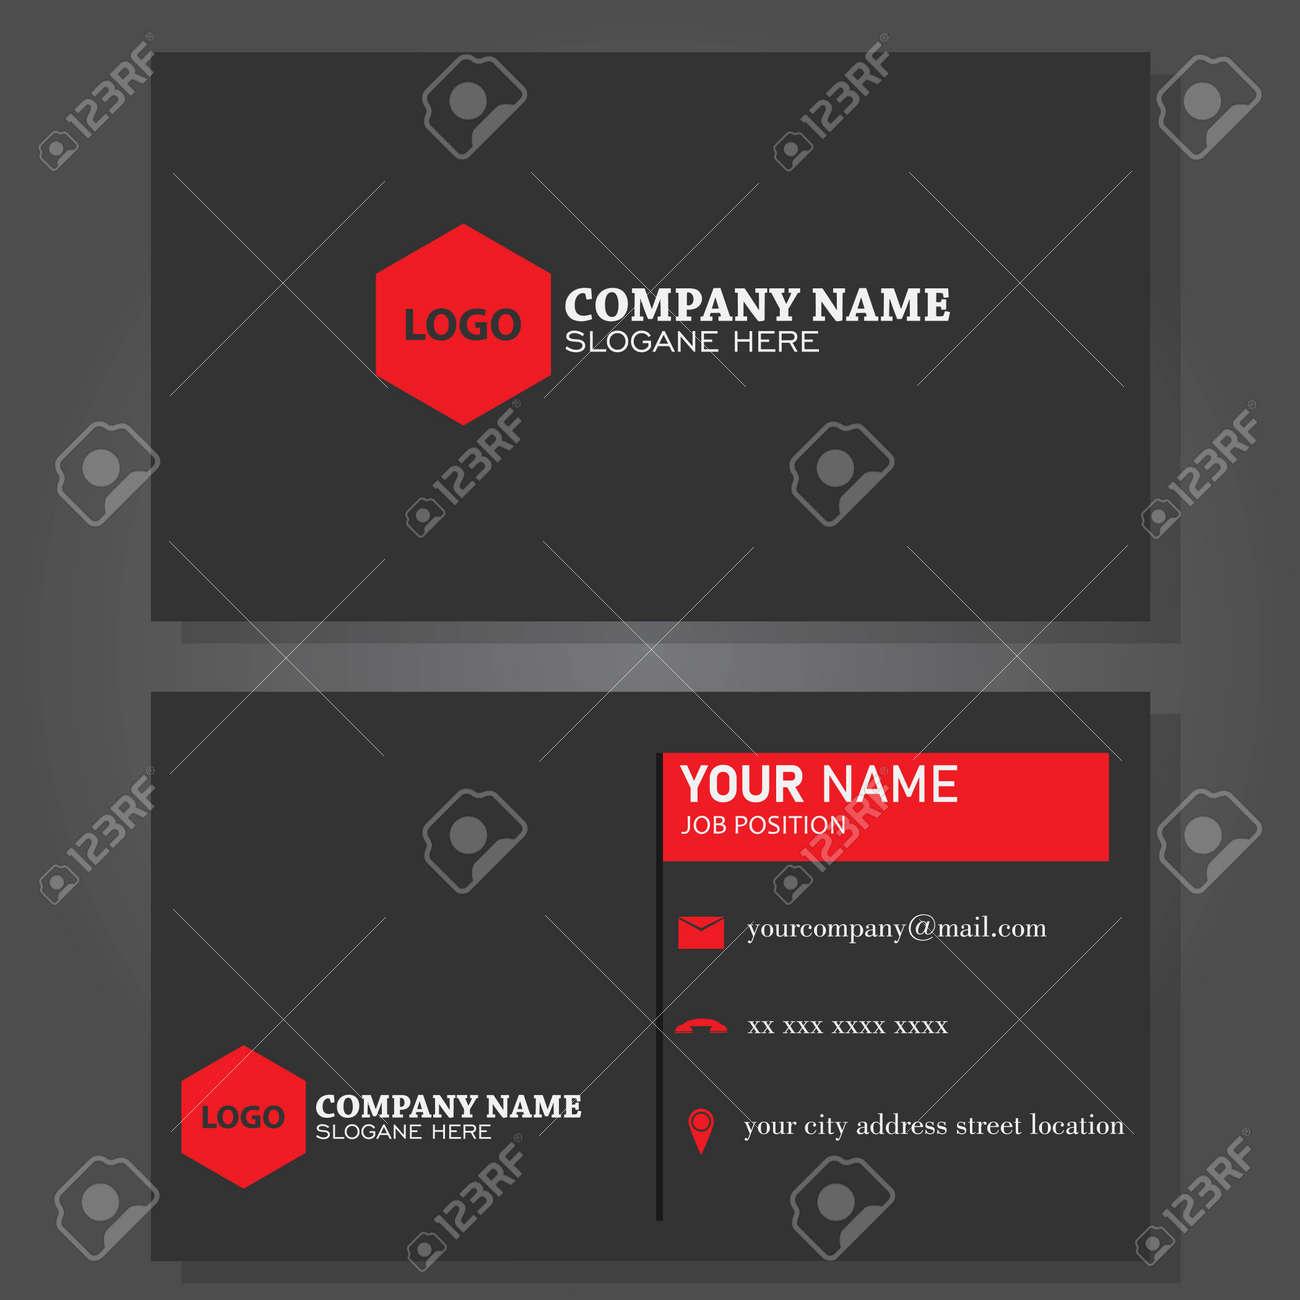 Illustration vector design of business card - 143778147